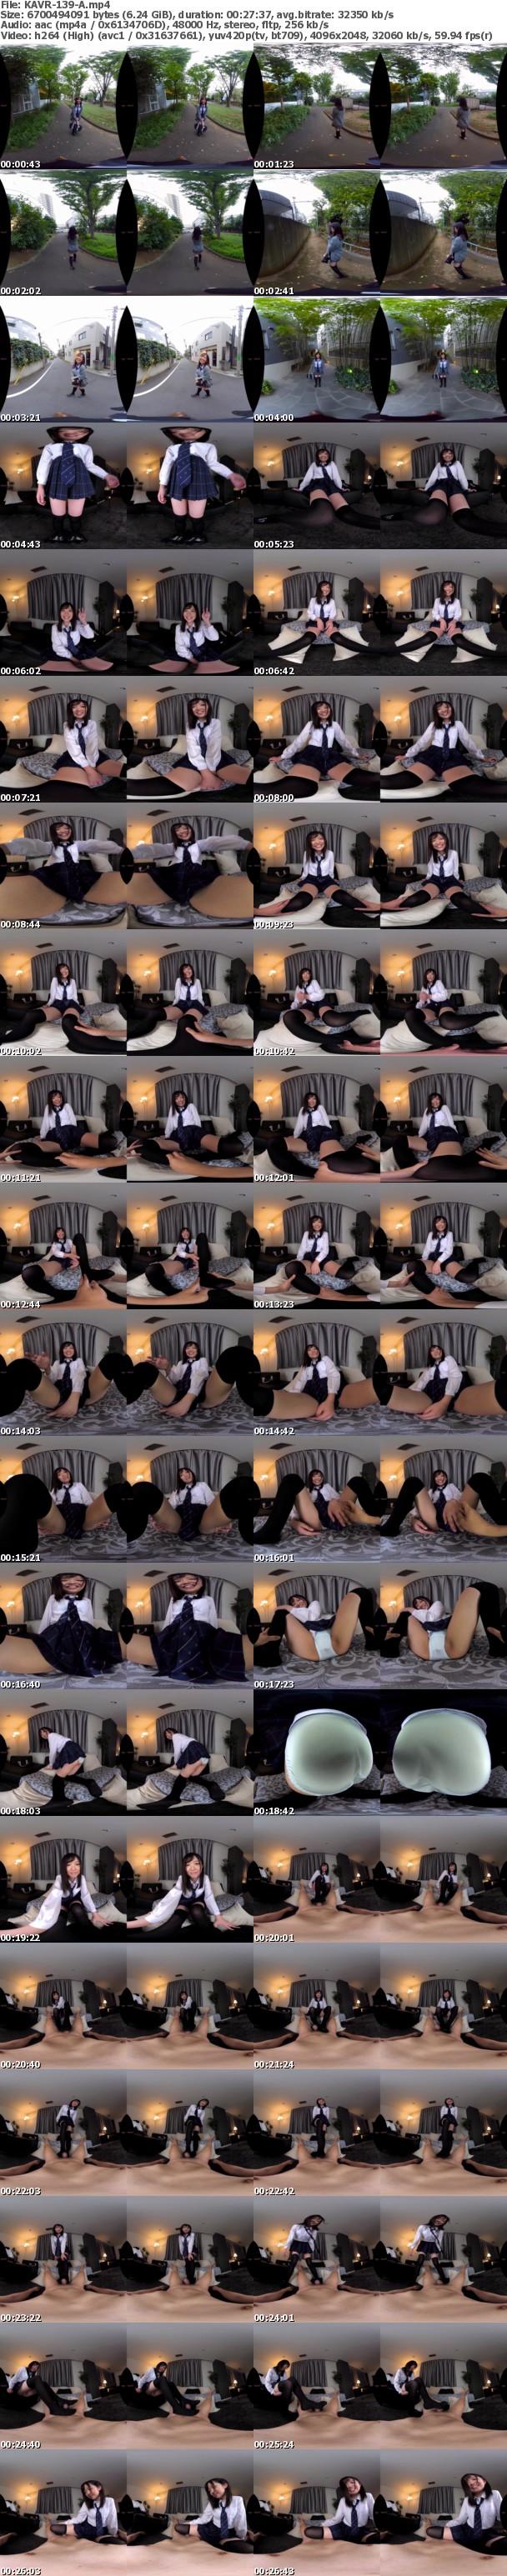 (VR) KAVR-139 制服少女とシティホテルで…放課後の蒸し蒸しパンティと絶対領域を愛でる変態嗜好性交 八乙女なな